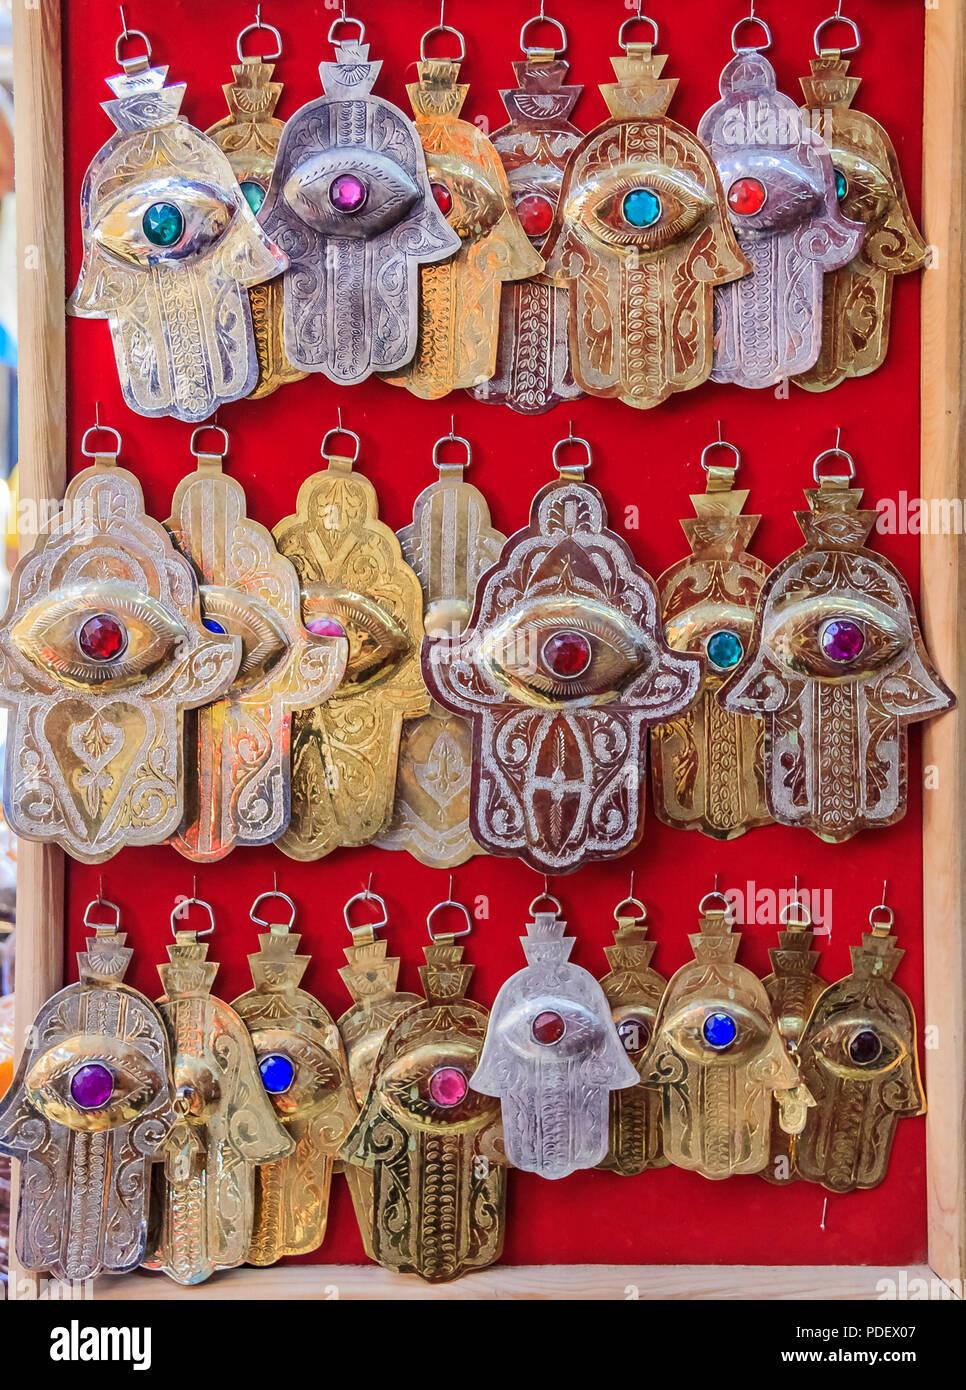 Ethnic Handmade Jewelry Representing Hamsa Or Hand Of Fatima Symbol